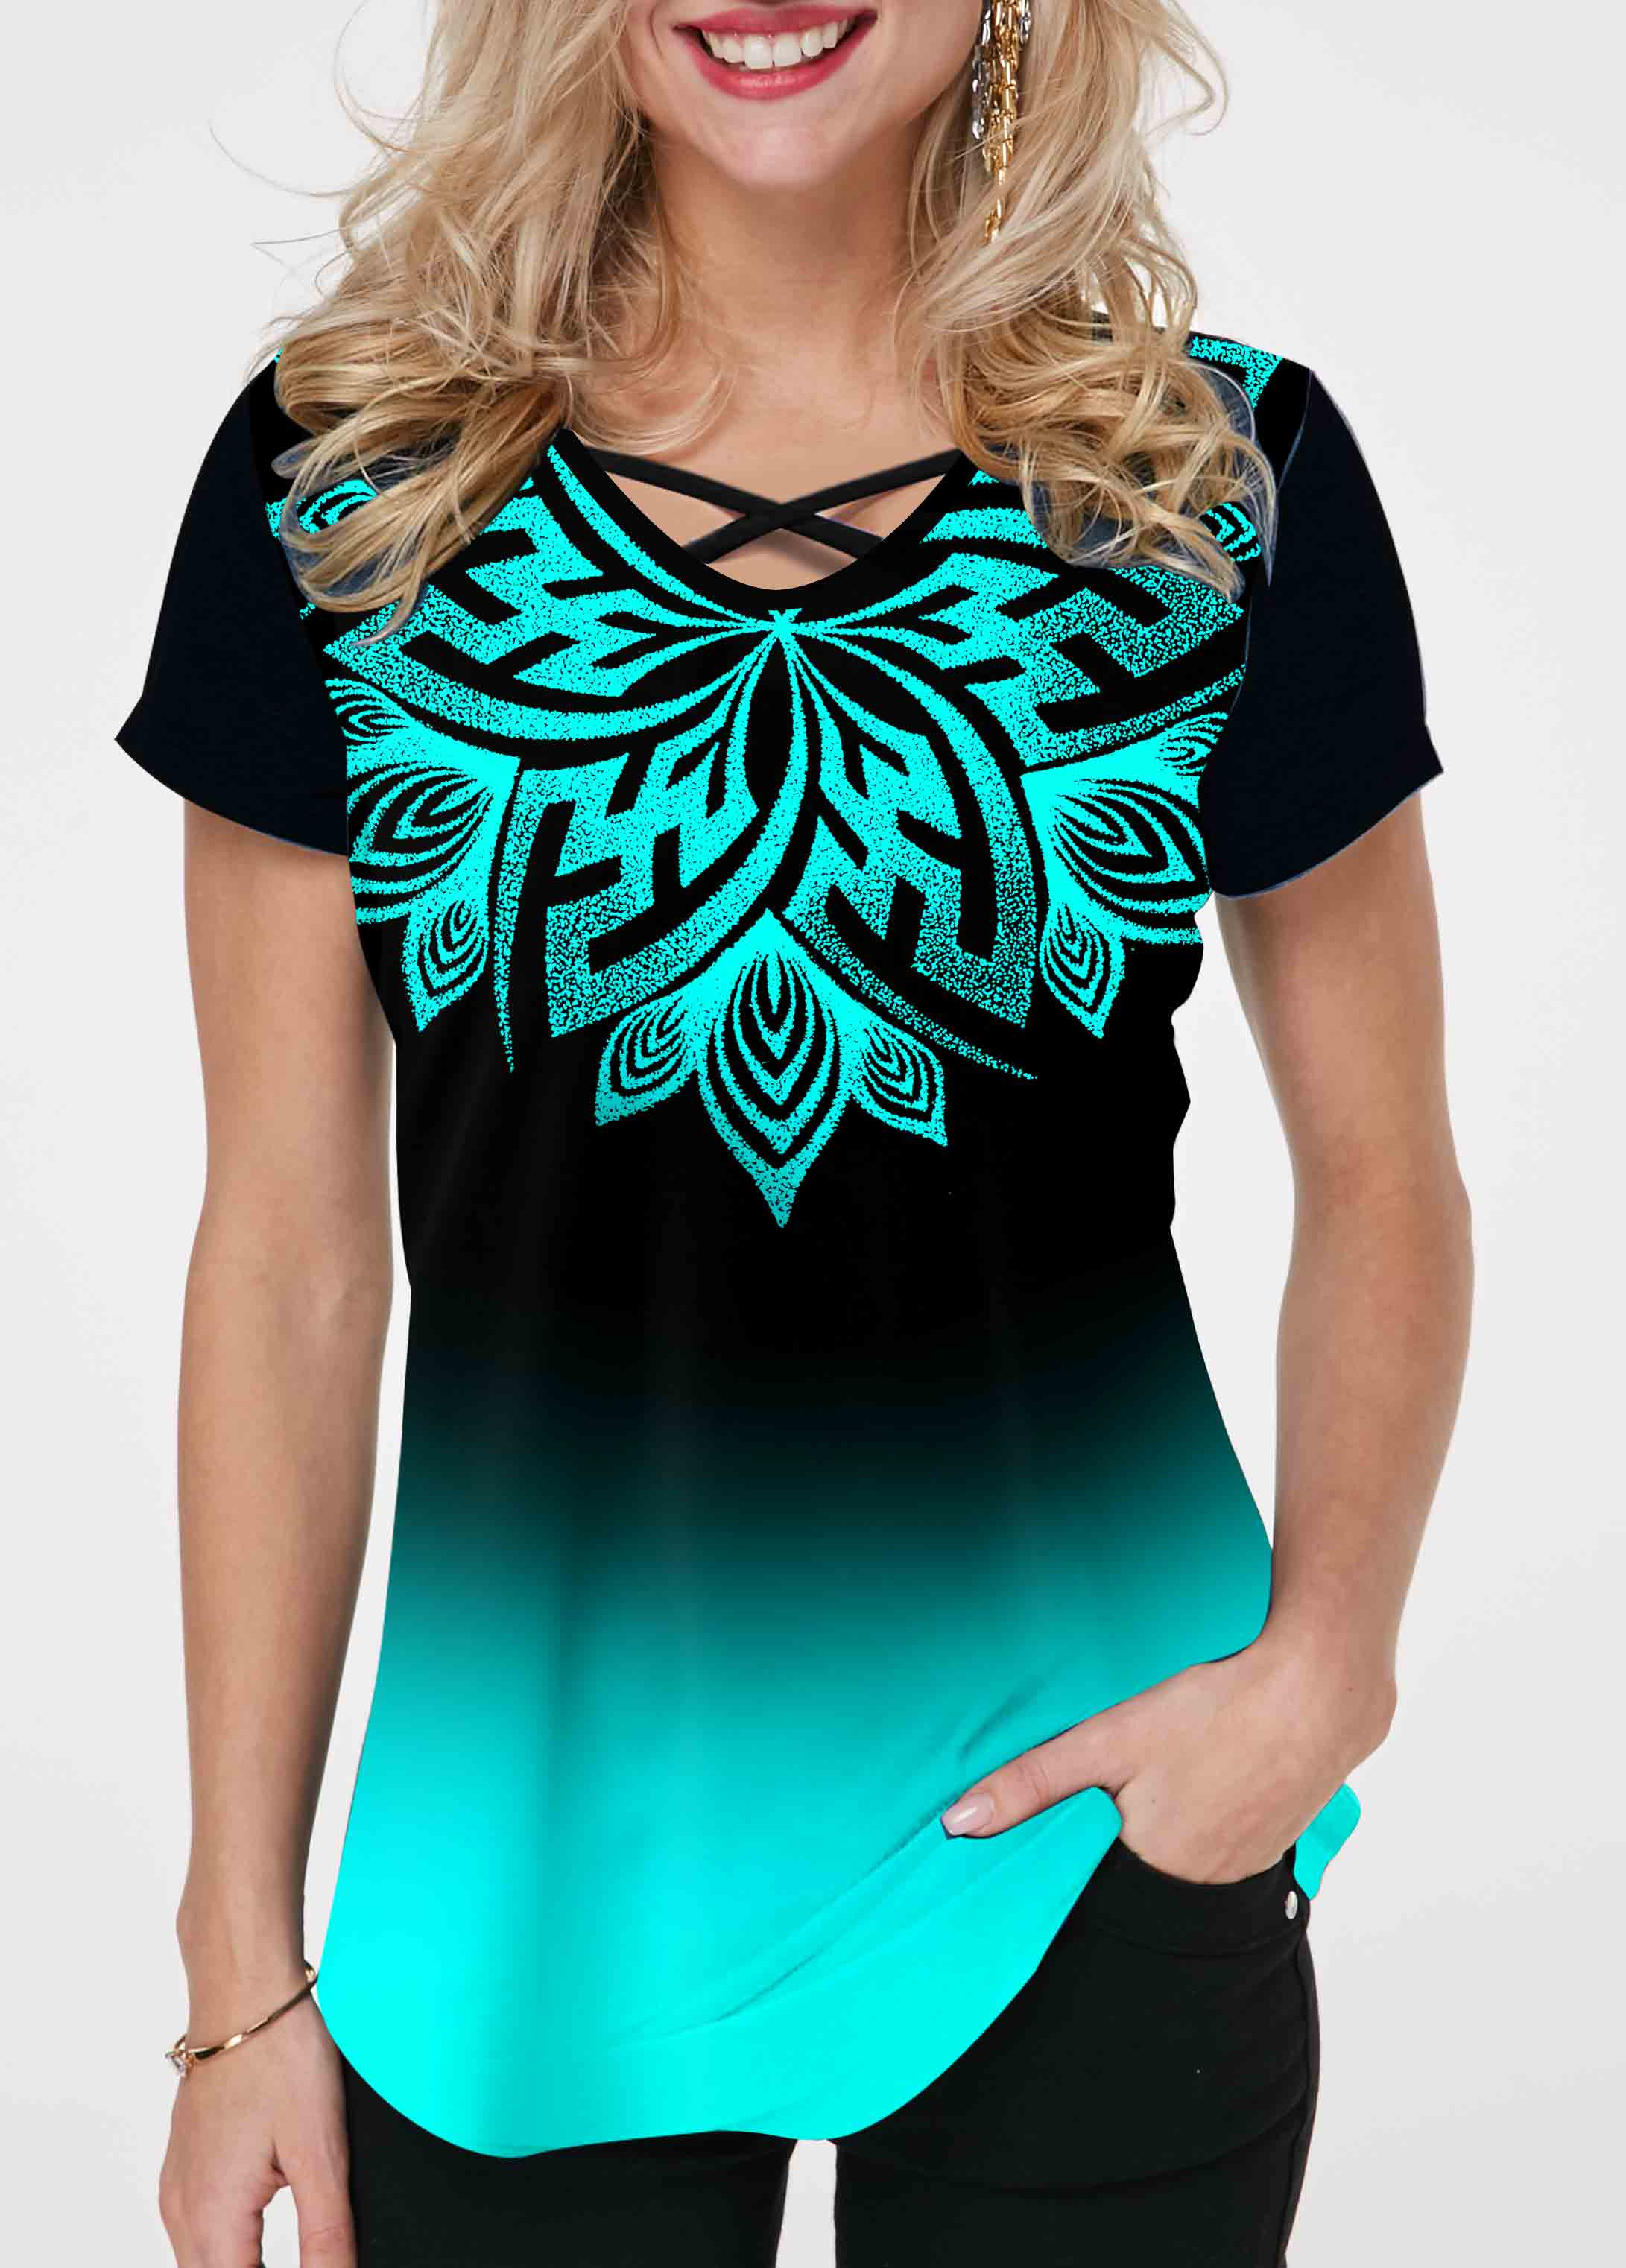 ROTITA Ombre Tribal Print Cross Strap T Shirt